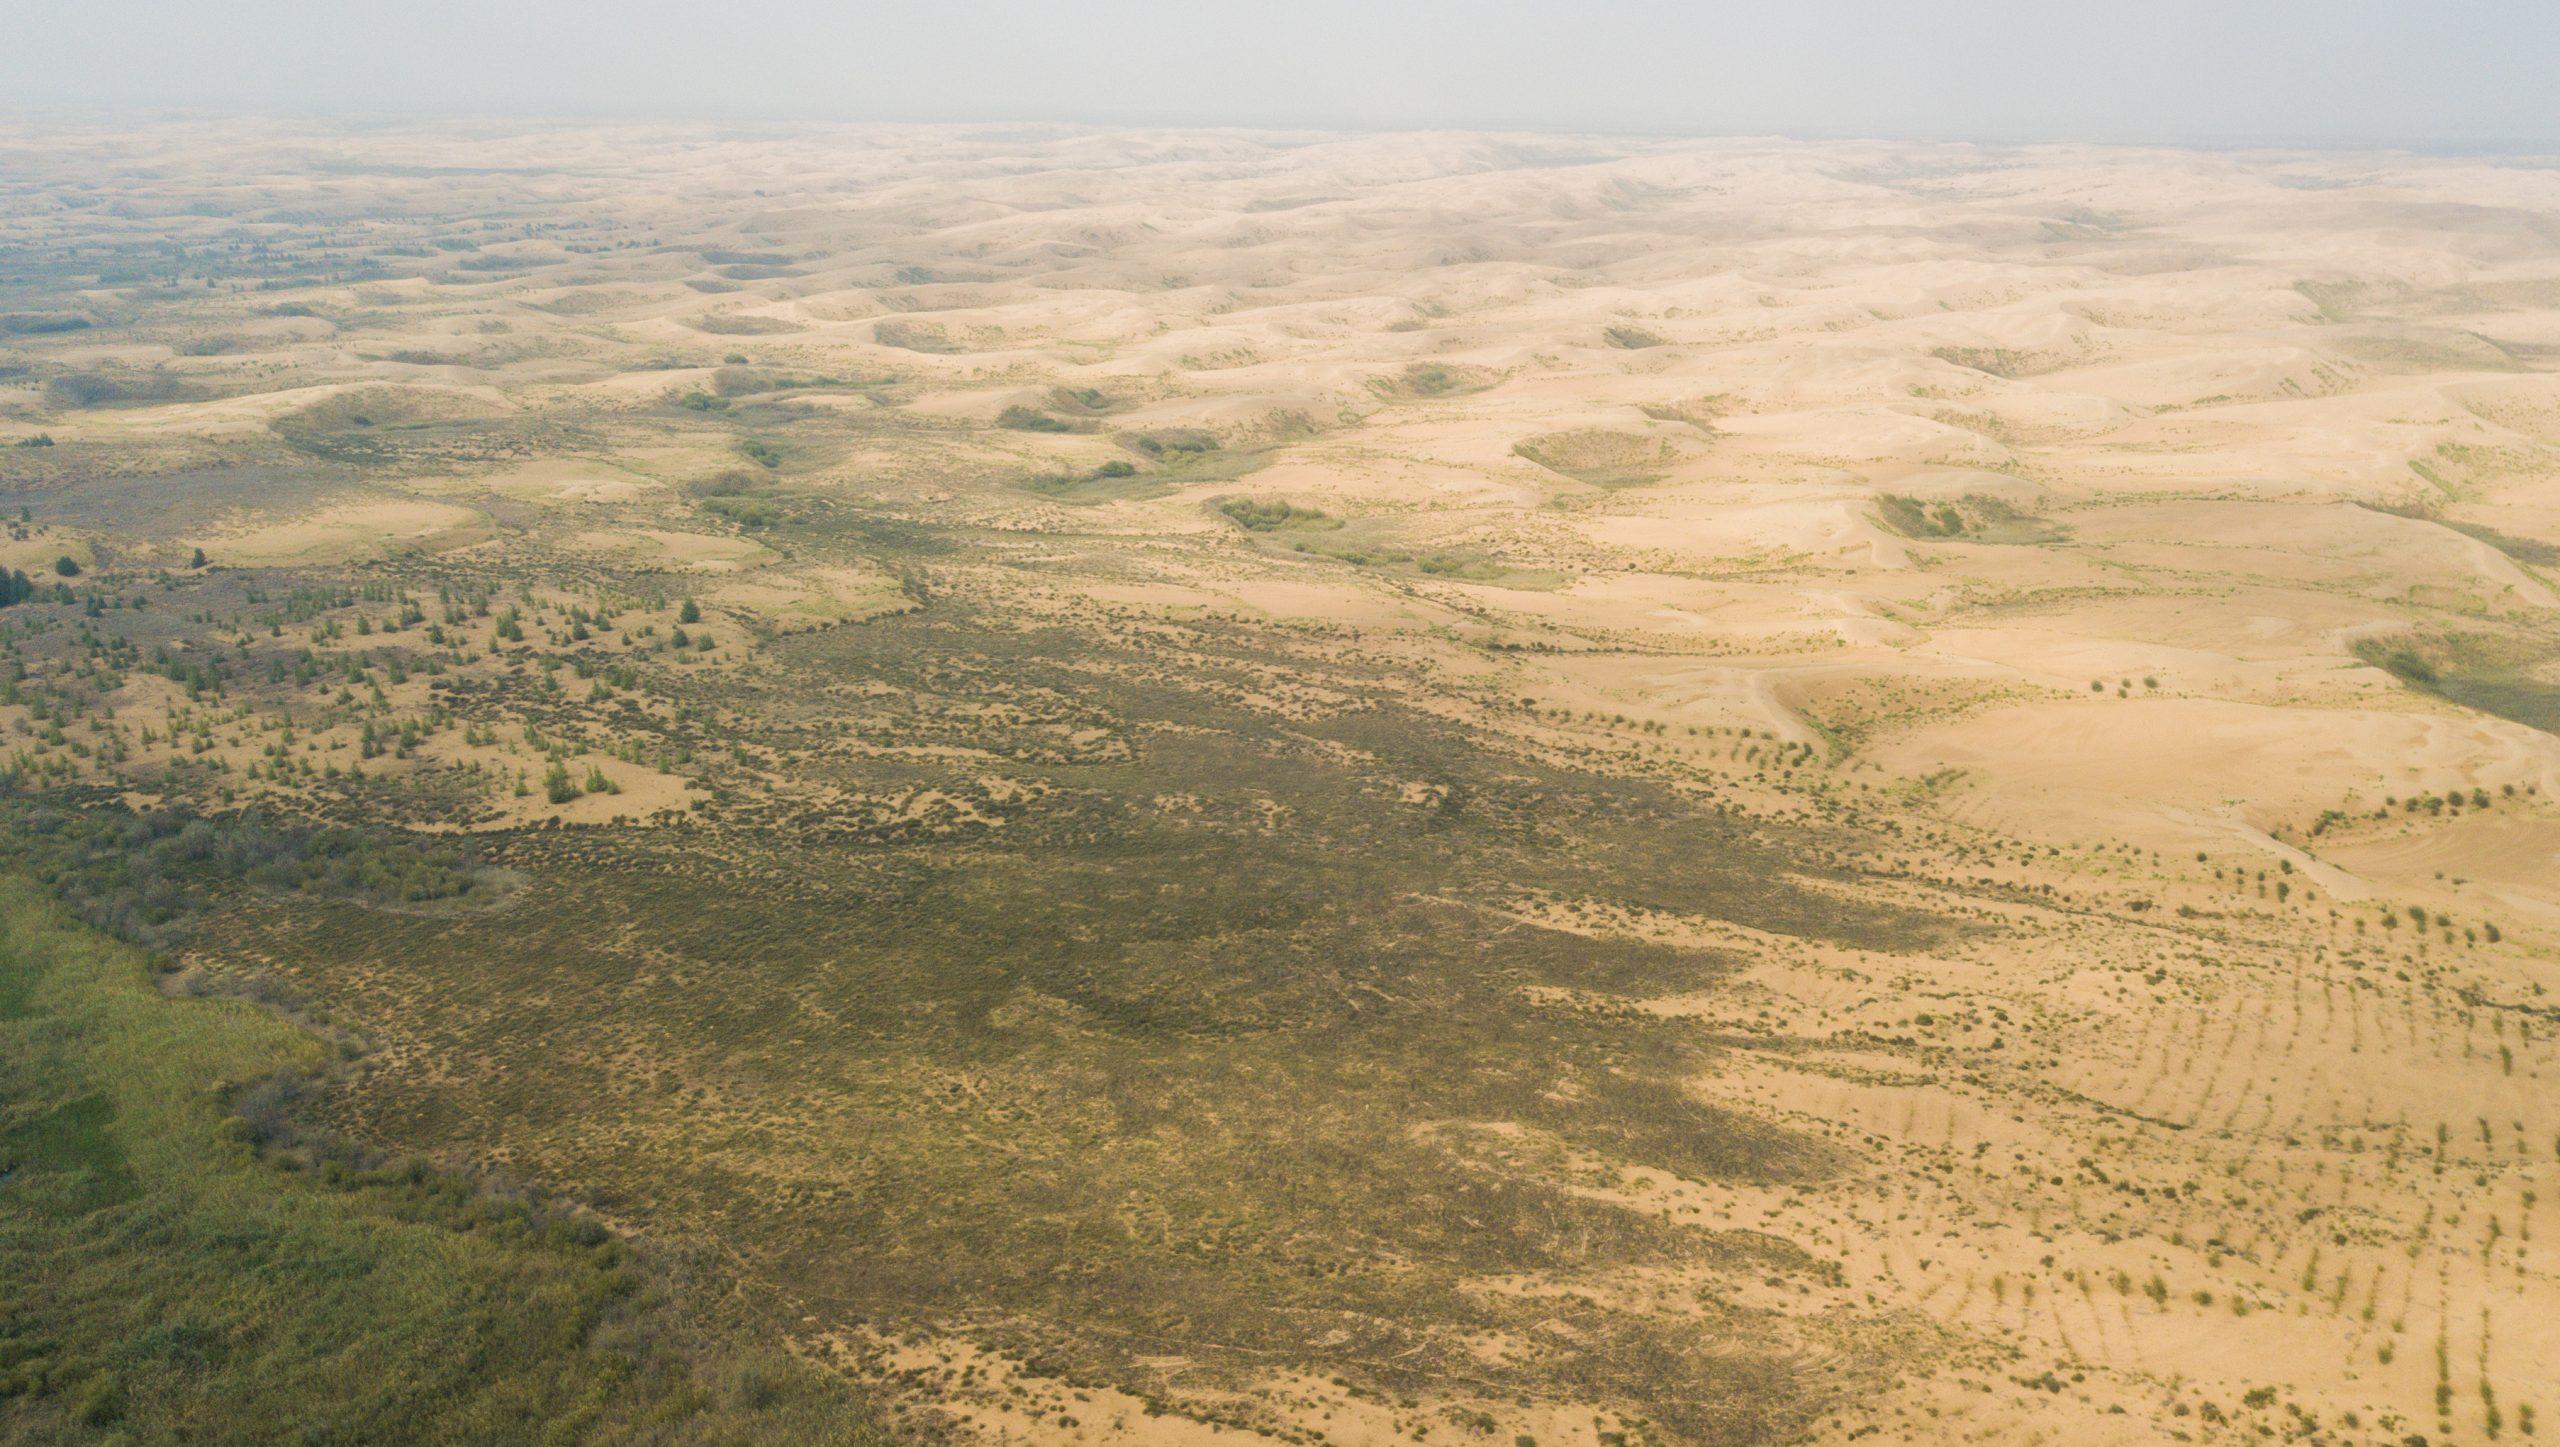 Región china de Mongolia Interior gana terreno en control de desertificación